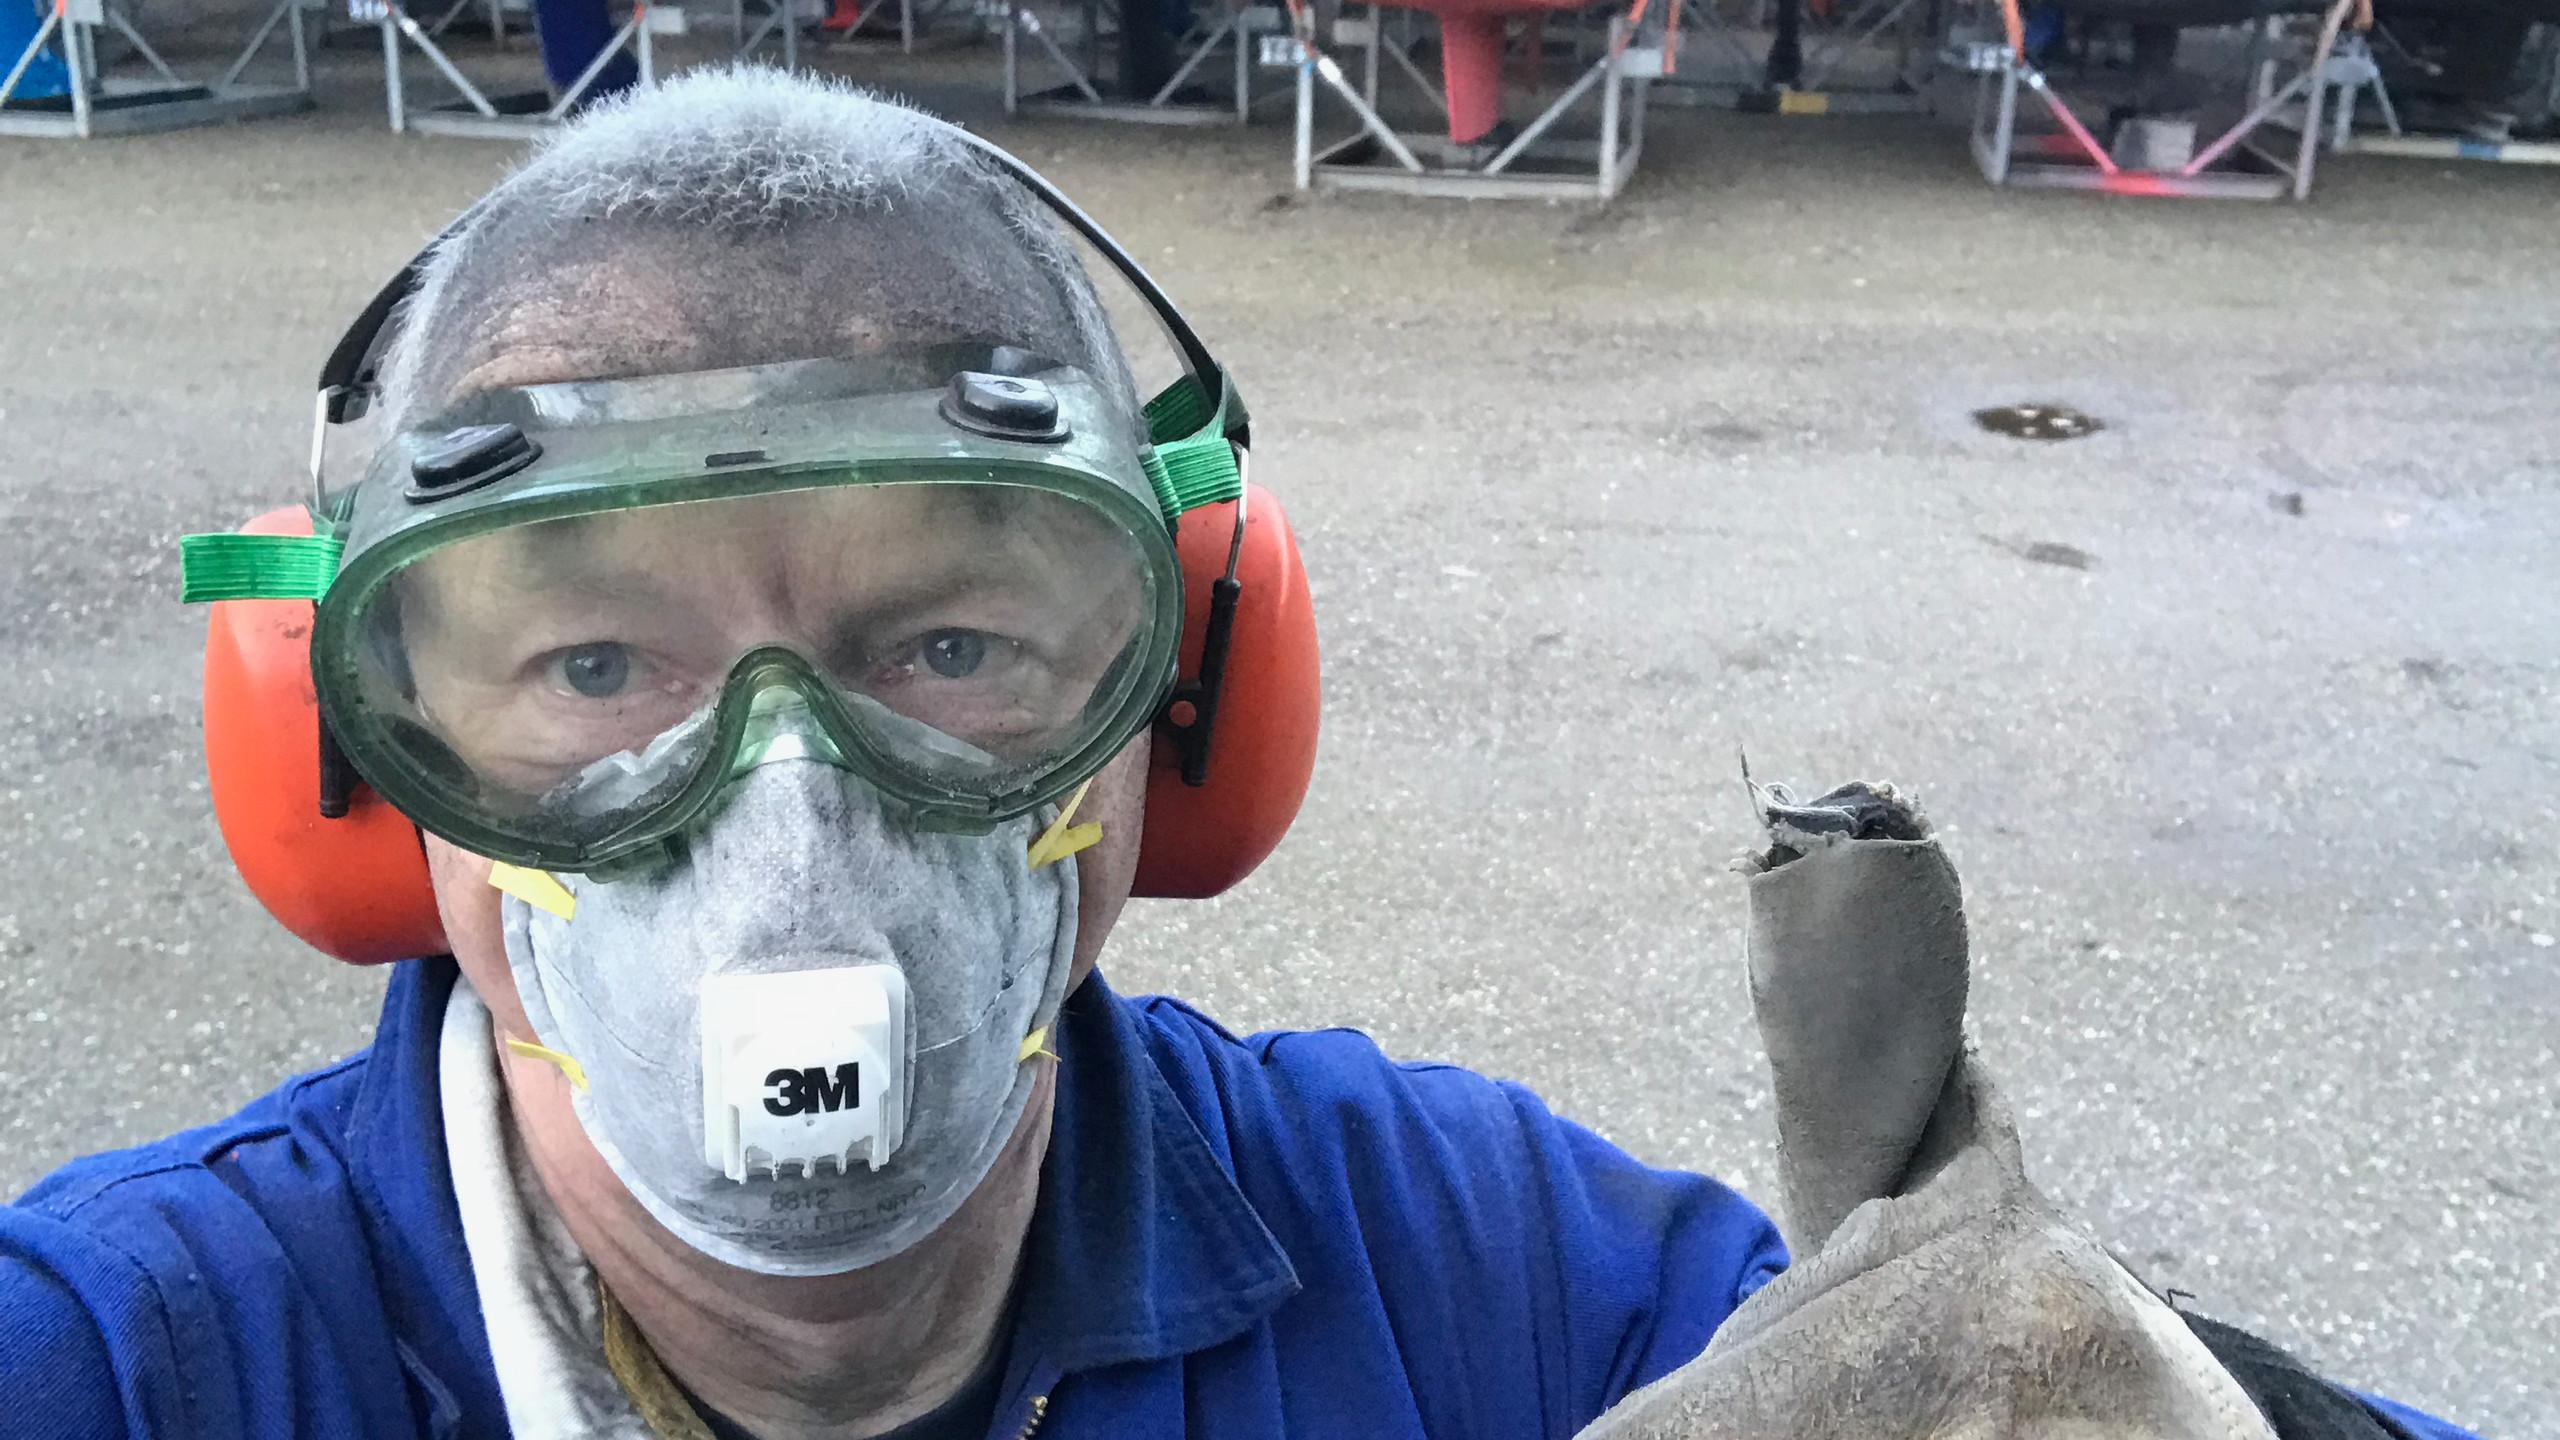 Dirty job #2